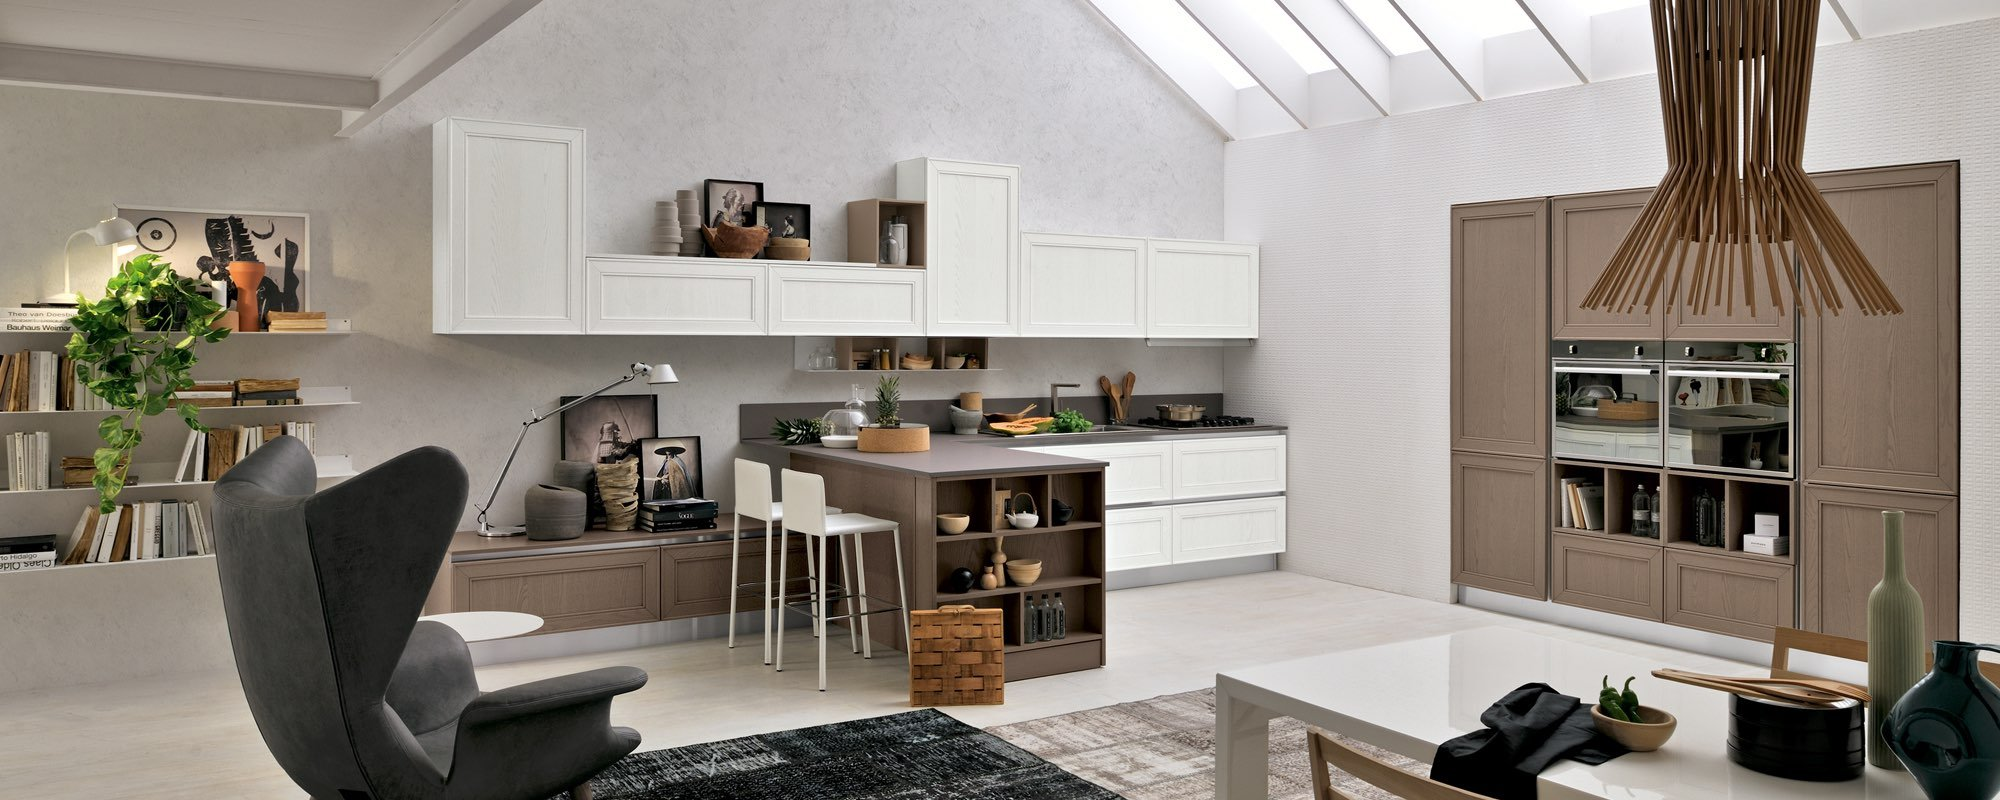 cucina bicolor contemporanea stosa -MAXIM